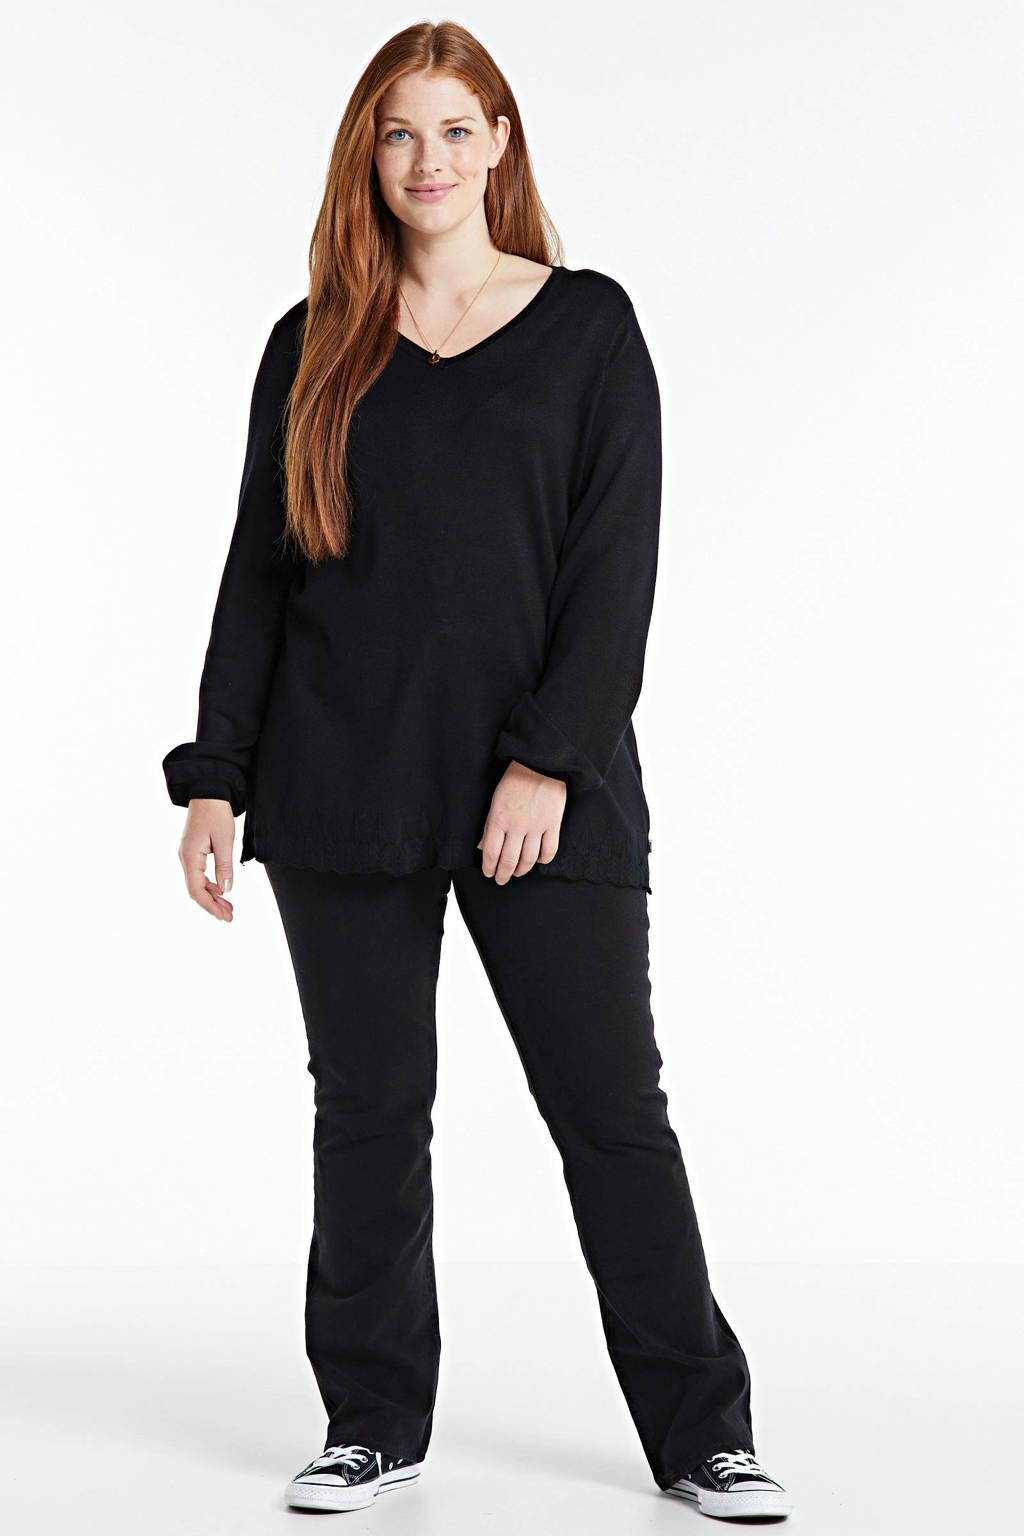 Zhenzi fijngebreide trui KOGLE 510 zwart, Zwart